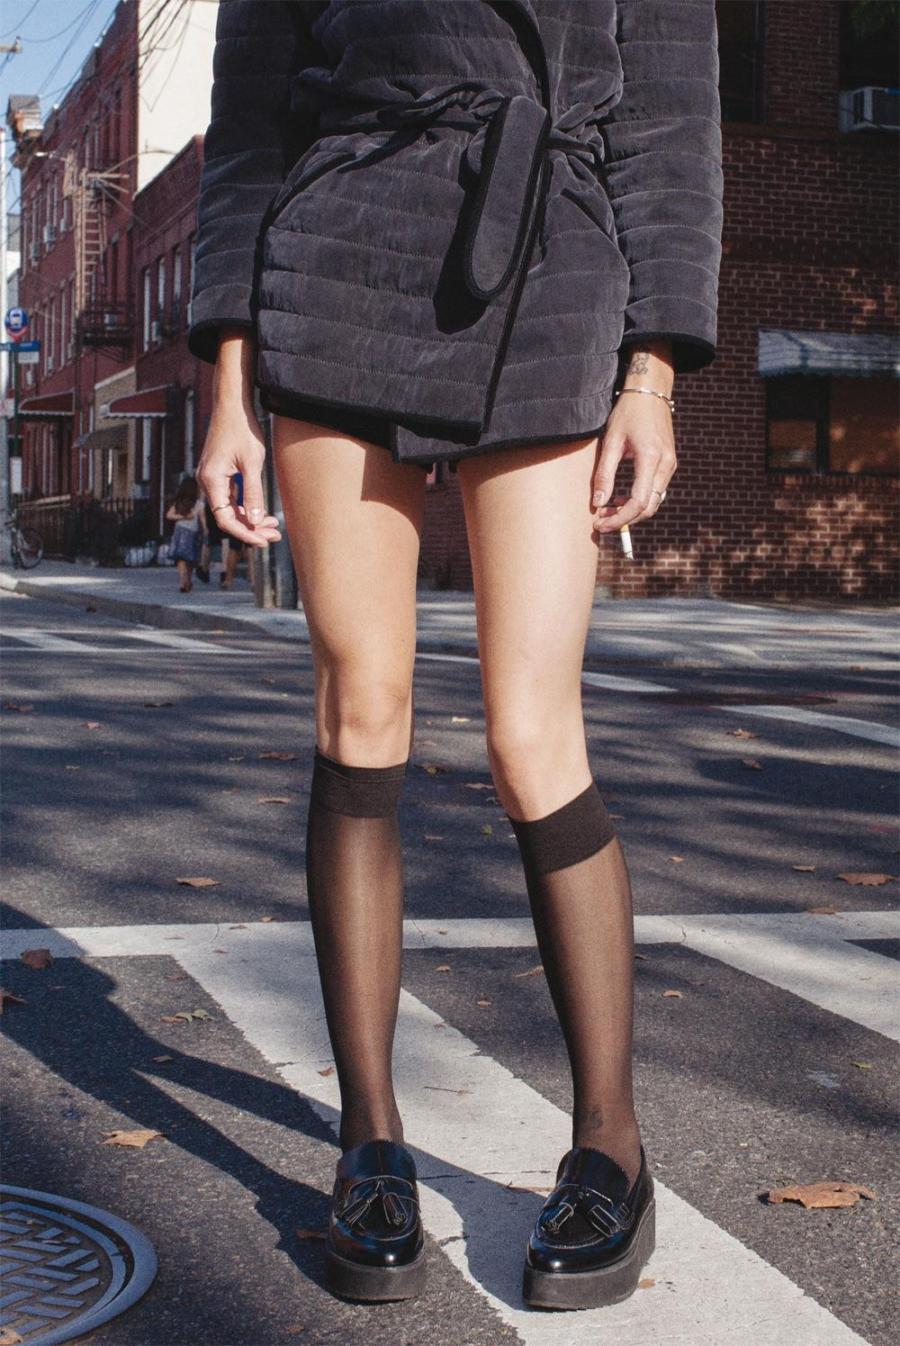 Sheer Socks - Tackling Sheer Style Trends For Spring and Summer // Notjessfashion.com